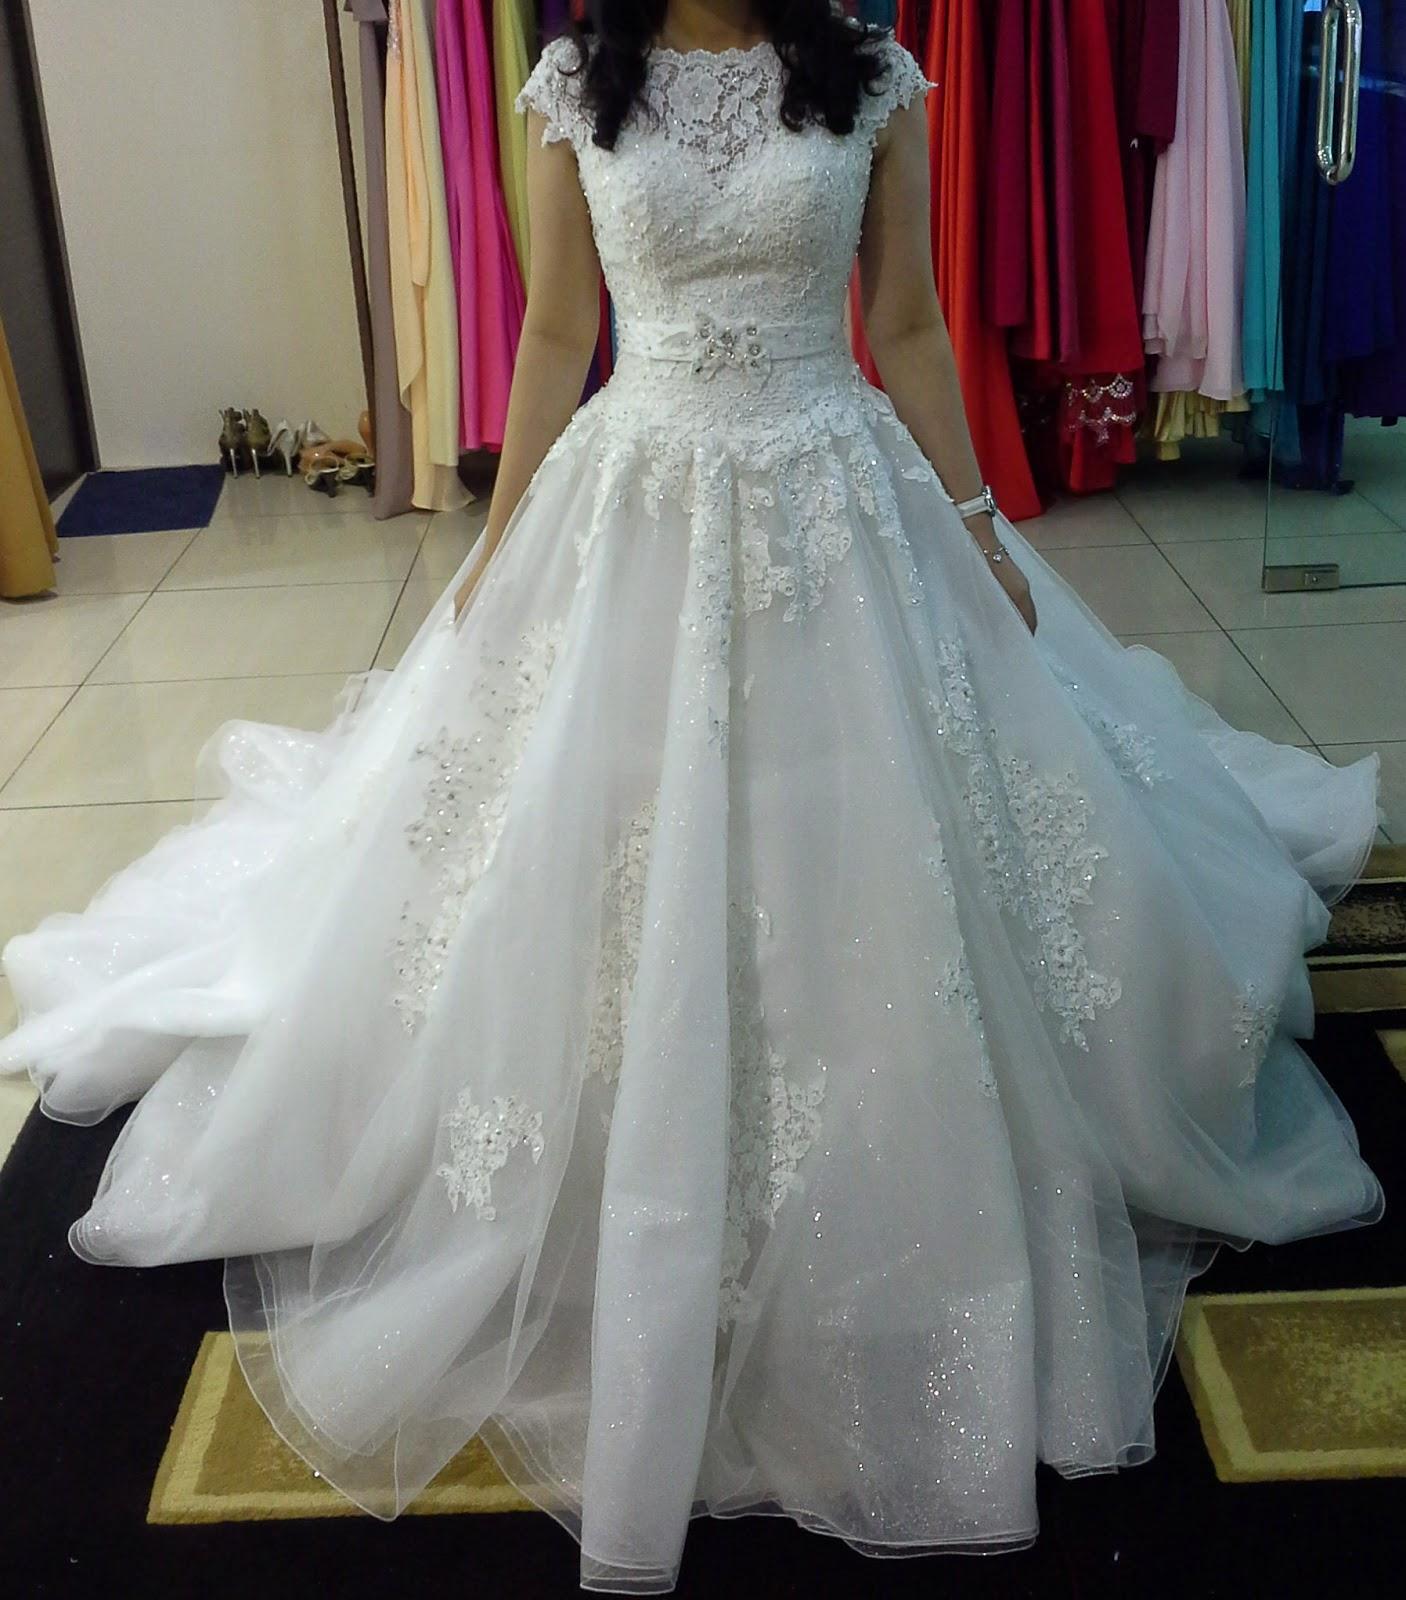 Wedding Dress Itc Mangga Dua ~ The Royal Weddings